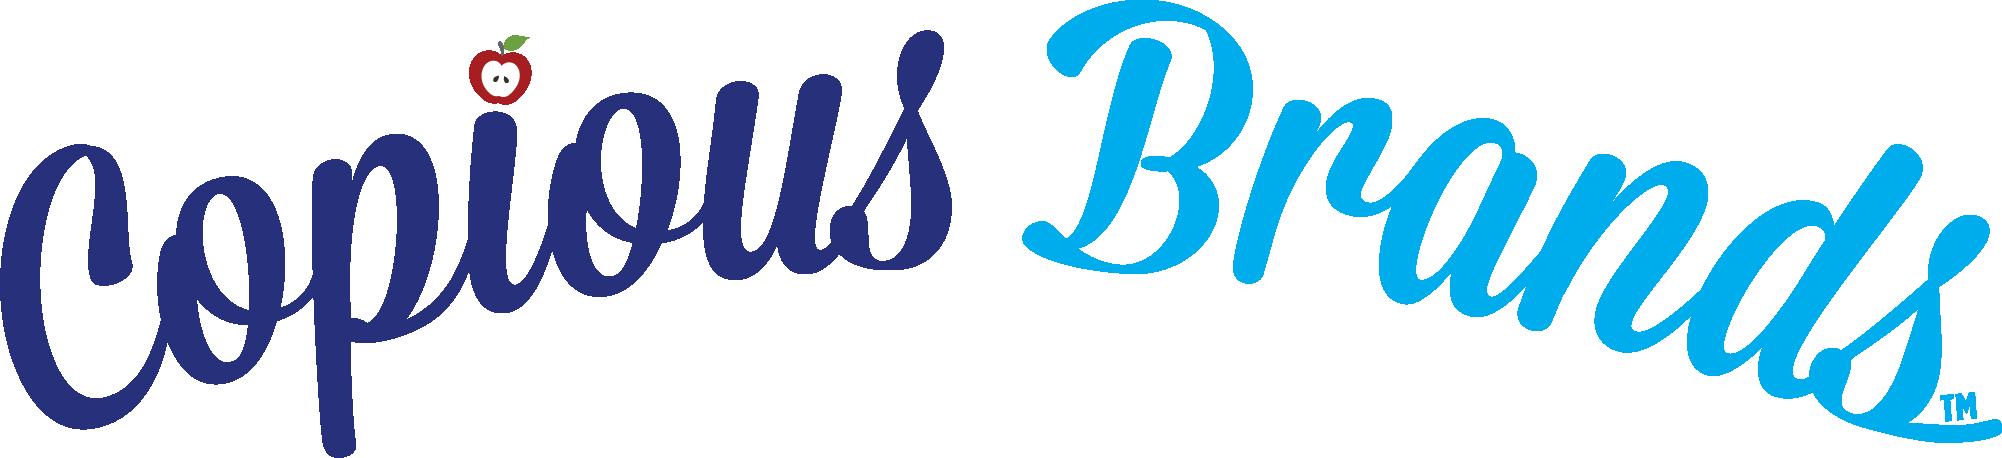 copious-brands.png